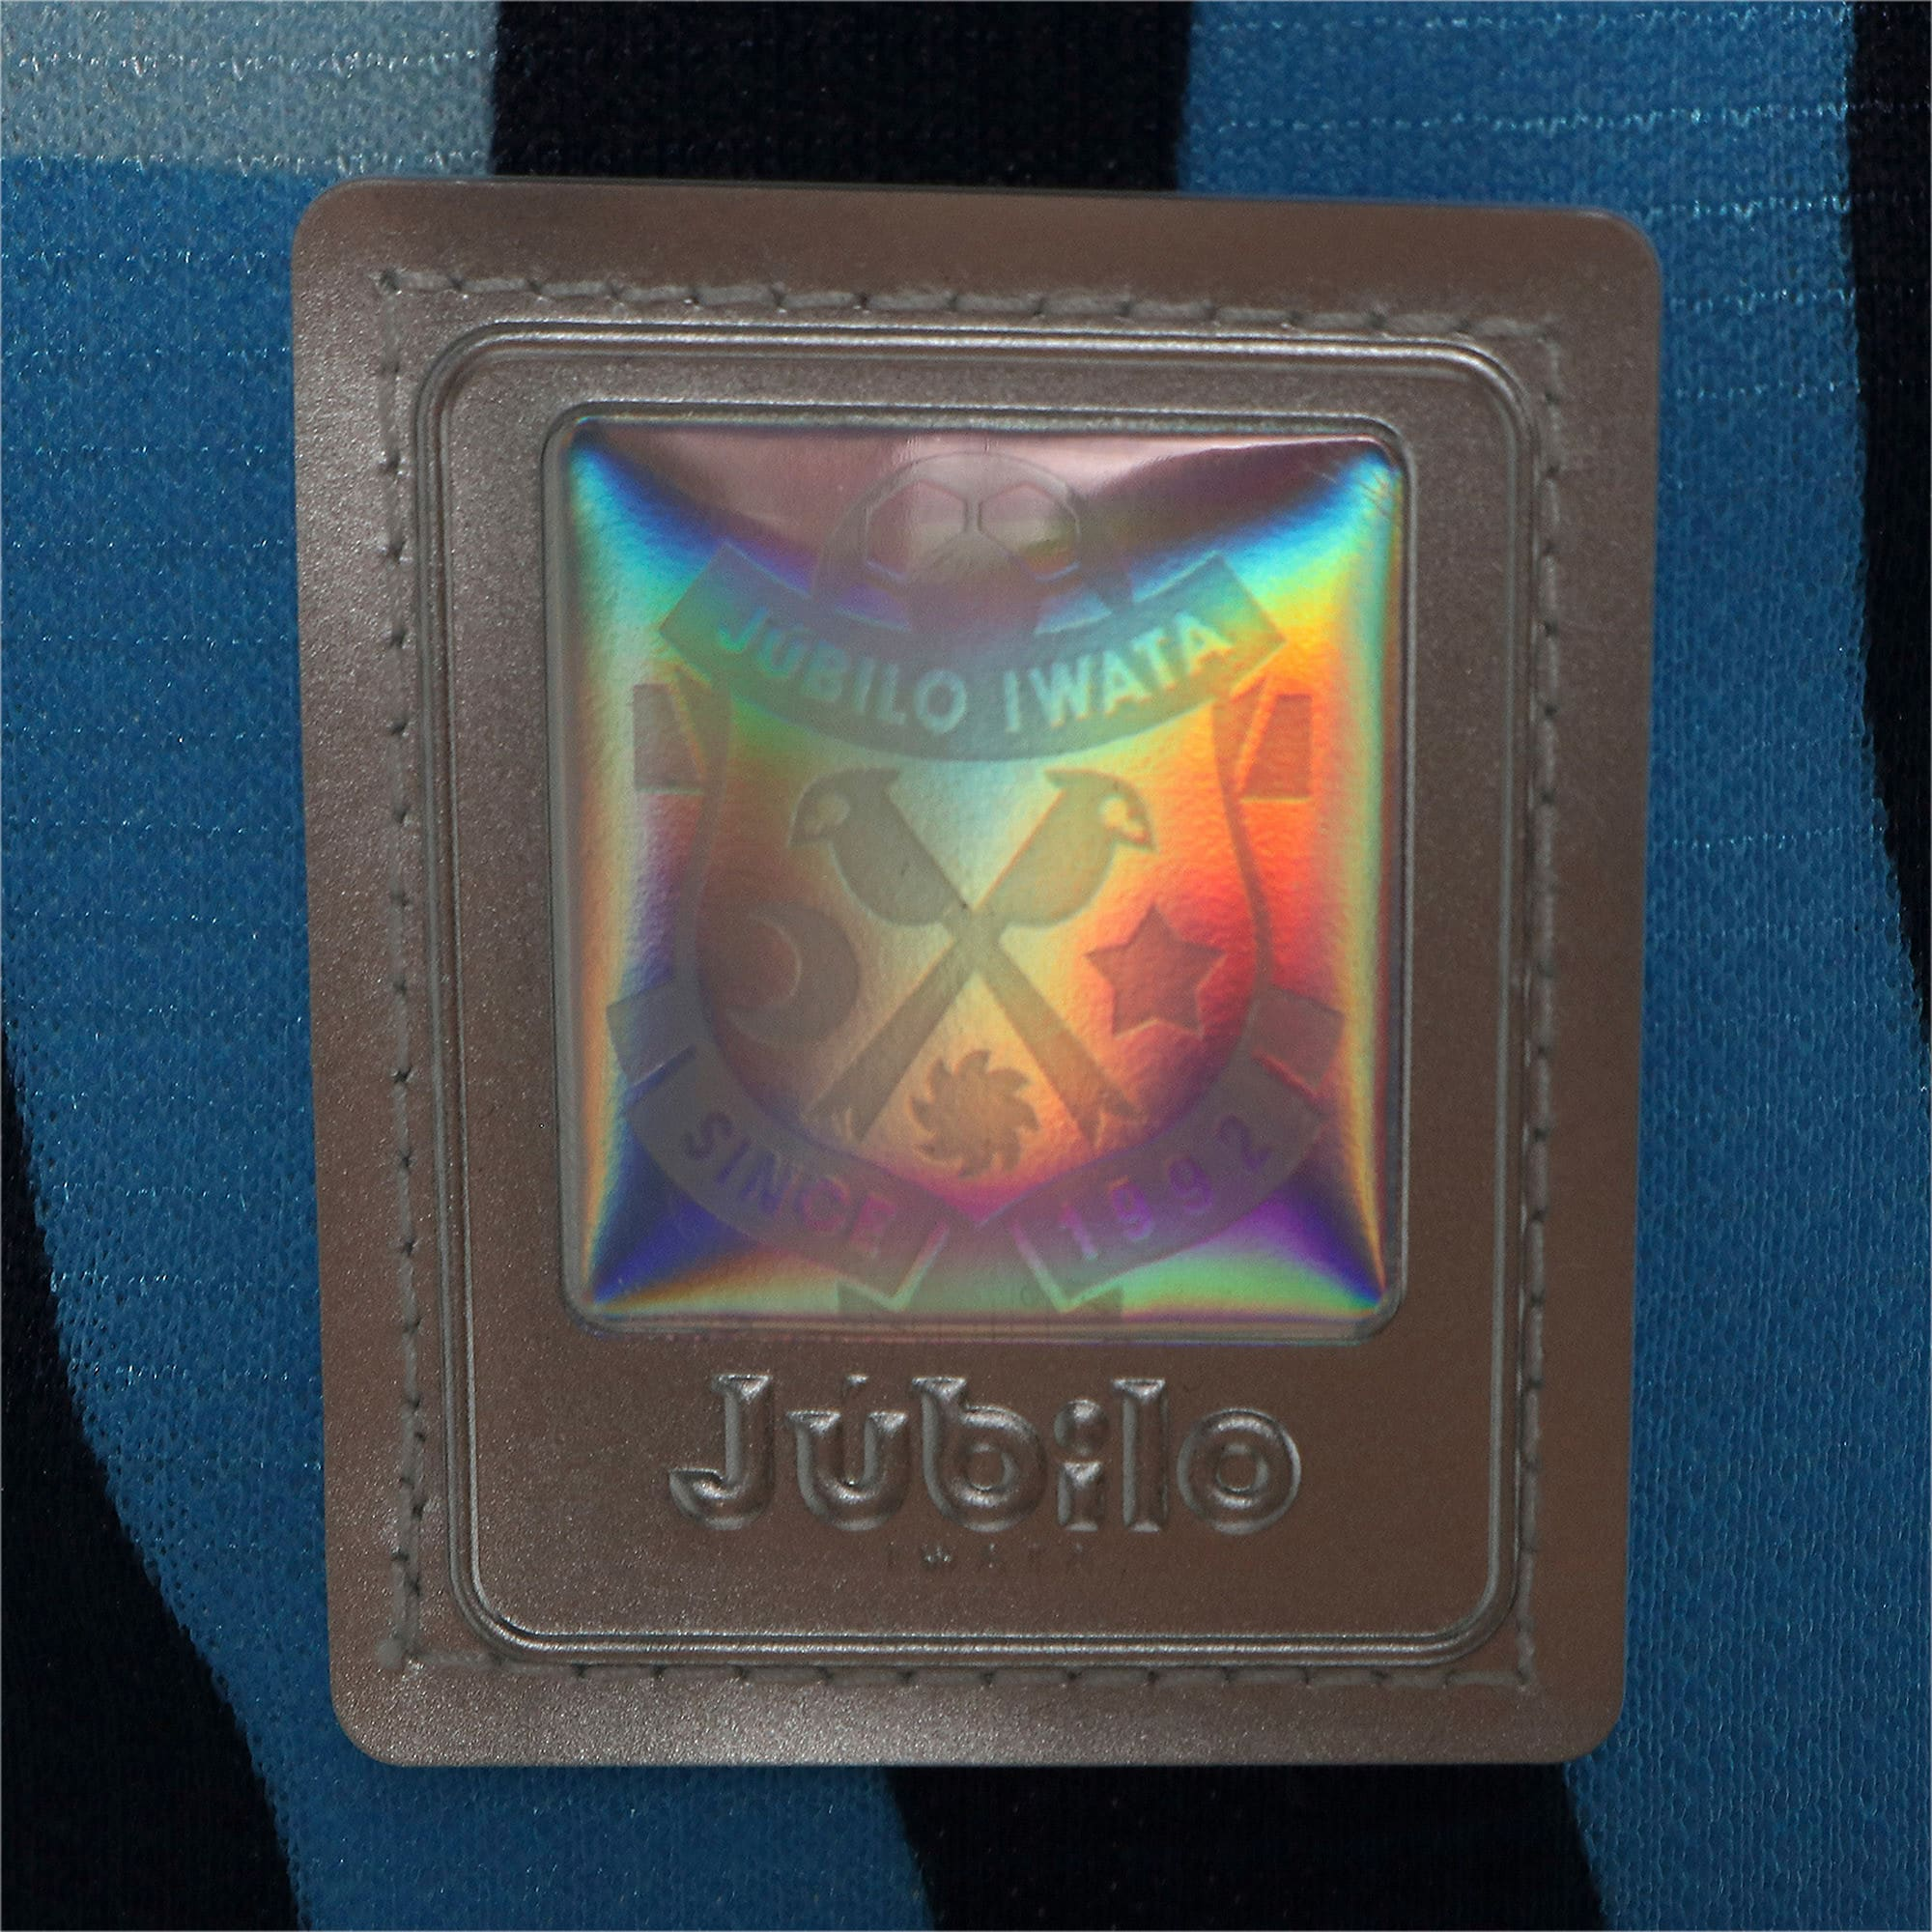 Thumbnail 8 of ジュビロ 19 リミテッド ハンソデゲームシャツ ユニフォーム, AZURE BLUE-Peacoat, medium-JPN